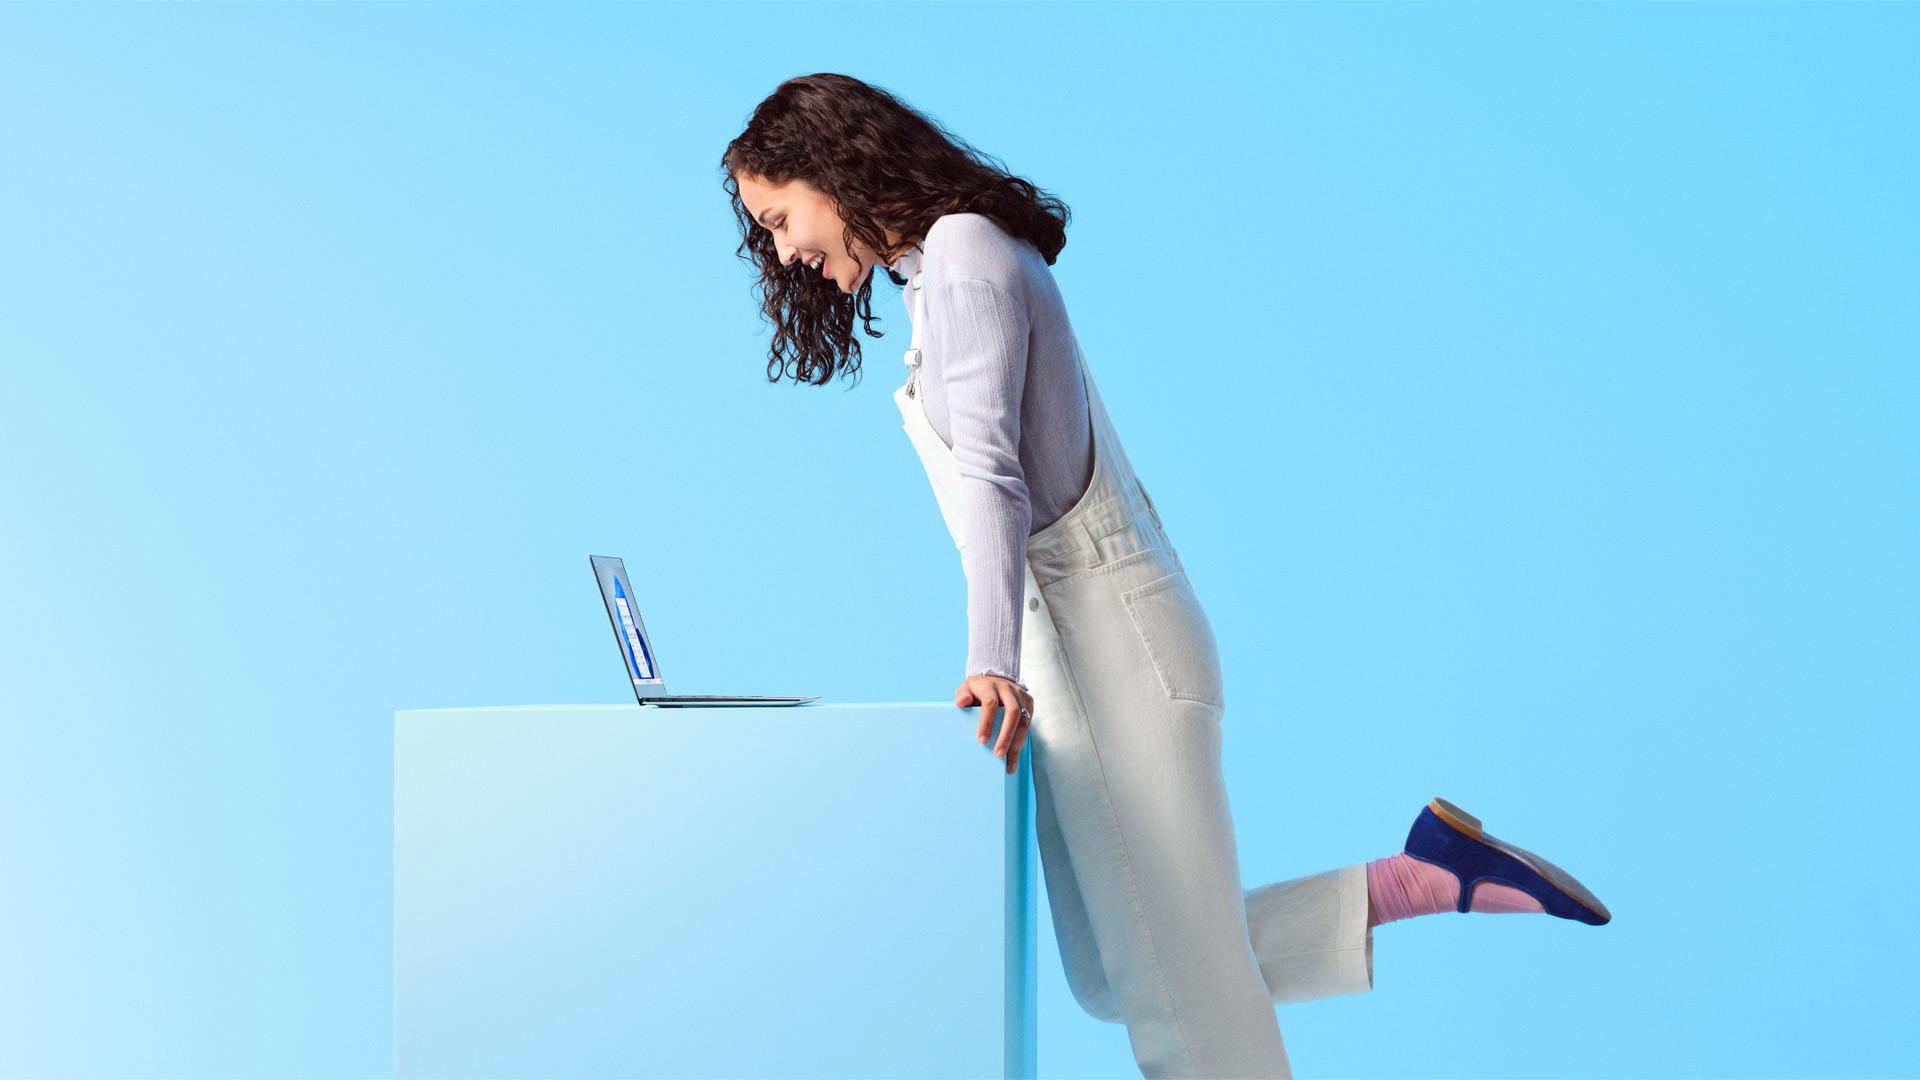 Femme souriante regardant un ordinateur portable